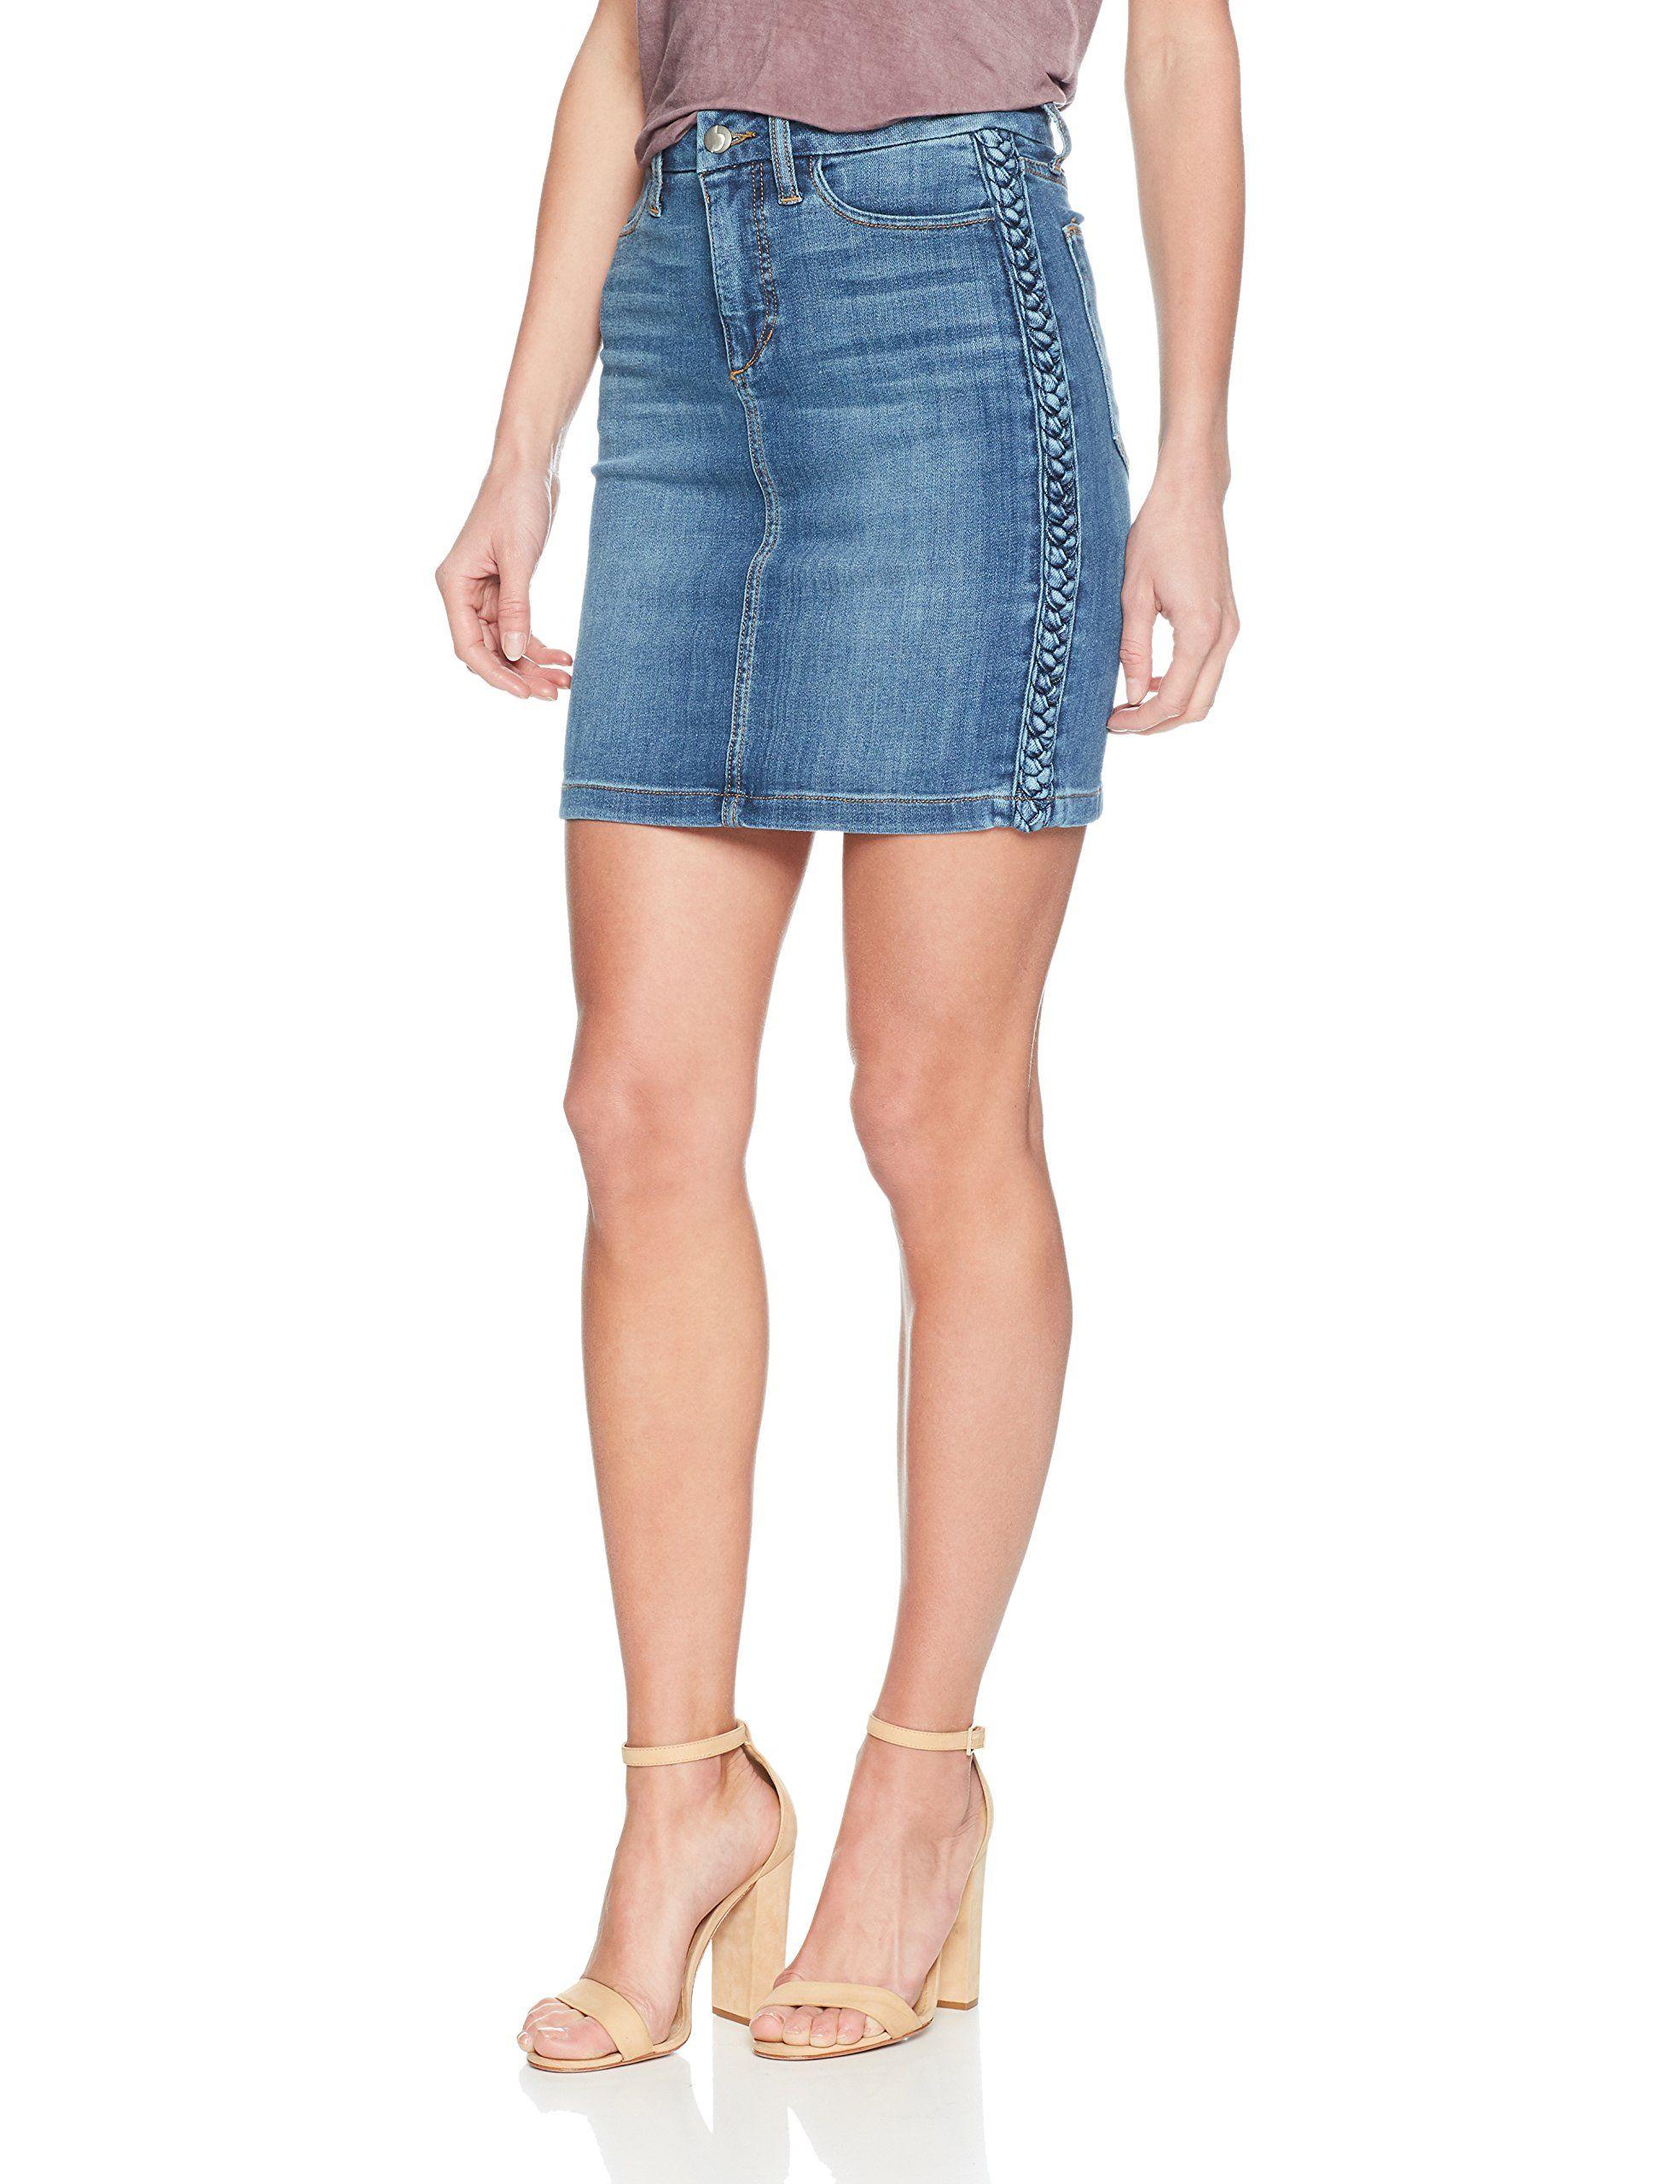 Joes Jeans Womens High Rise Cut Off Jean Skirt